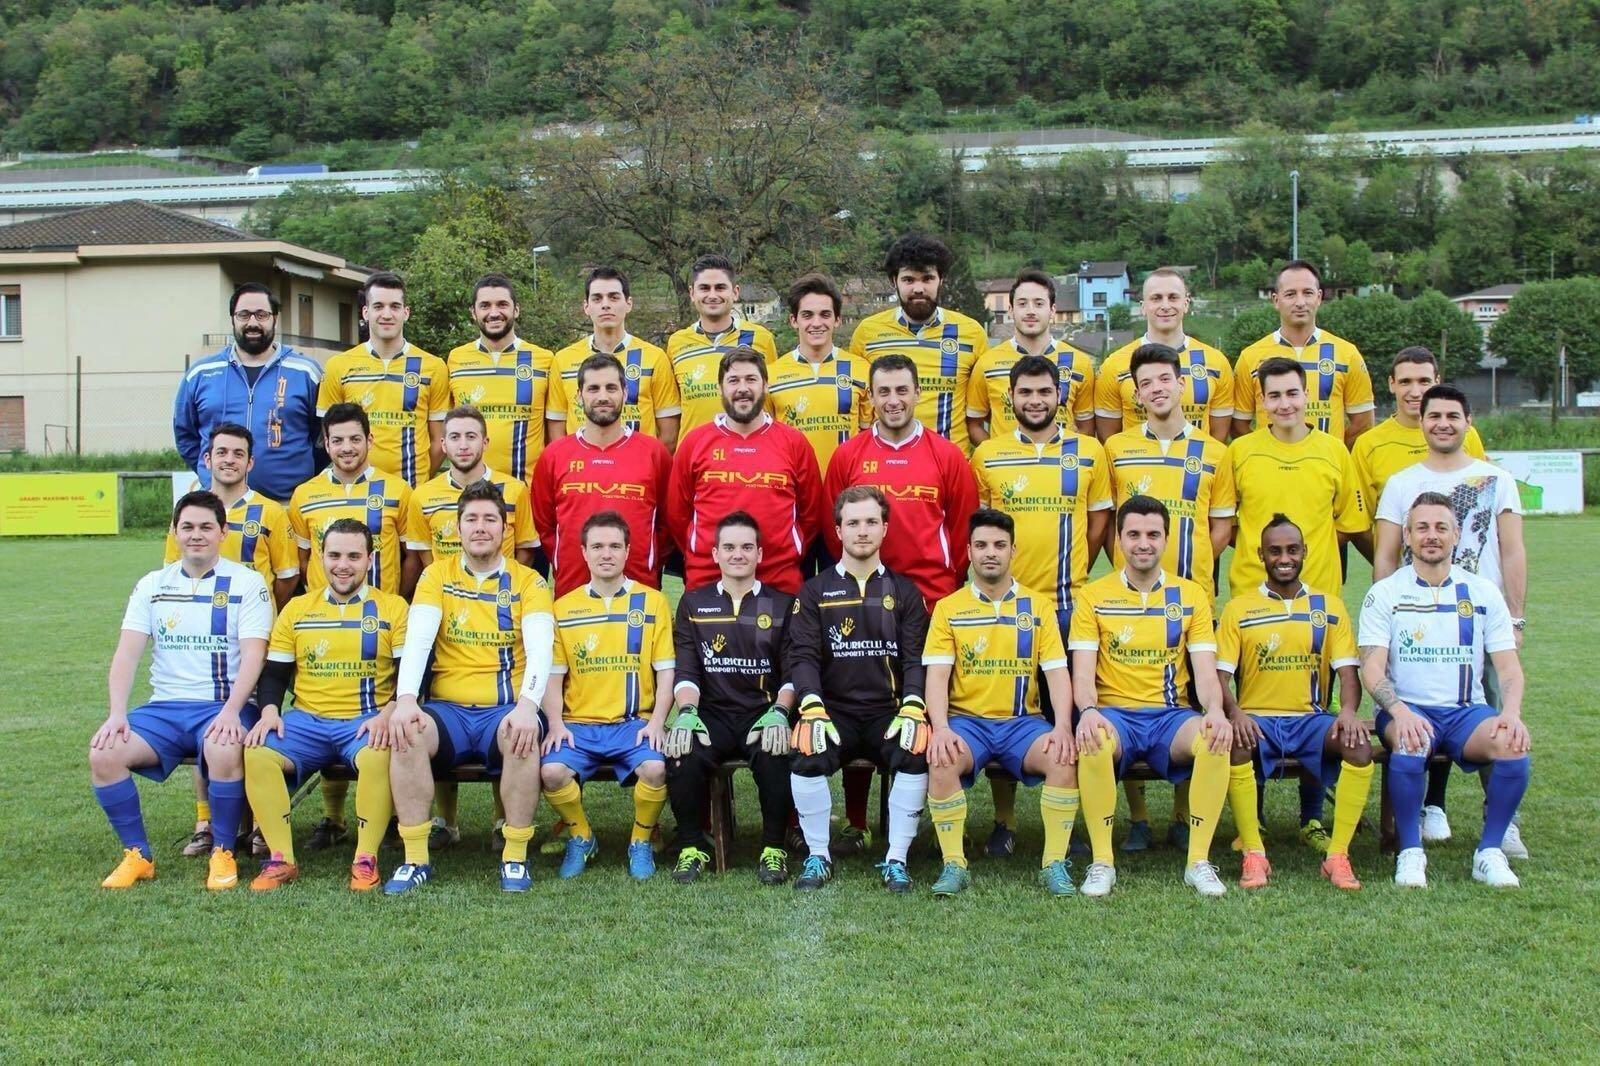 4L: Riva San Vitale – Insubrica 4:0